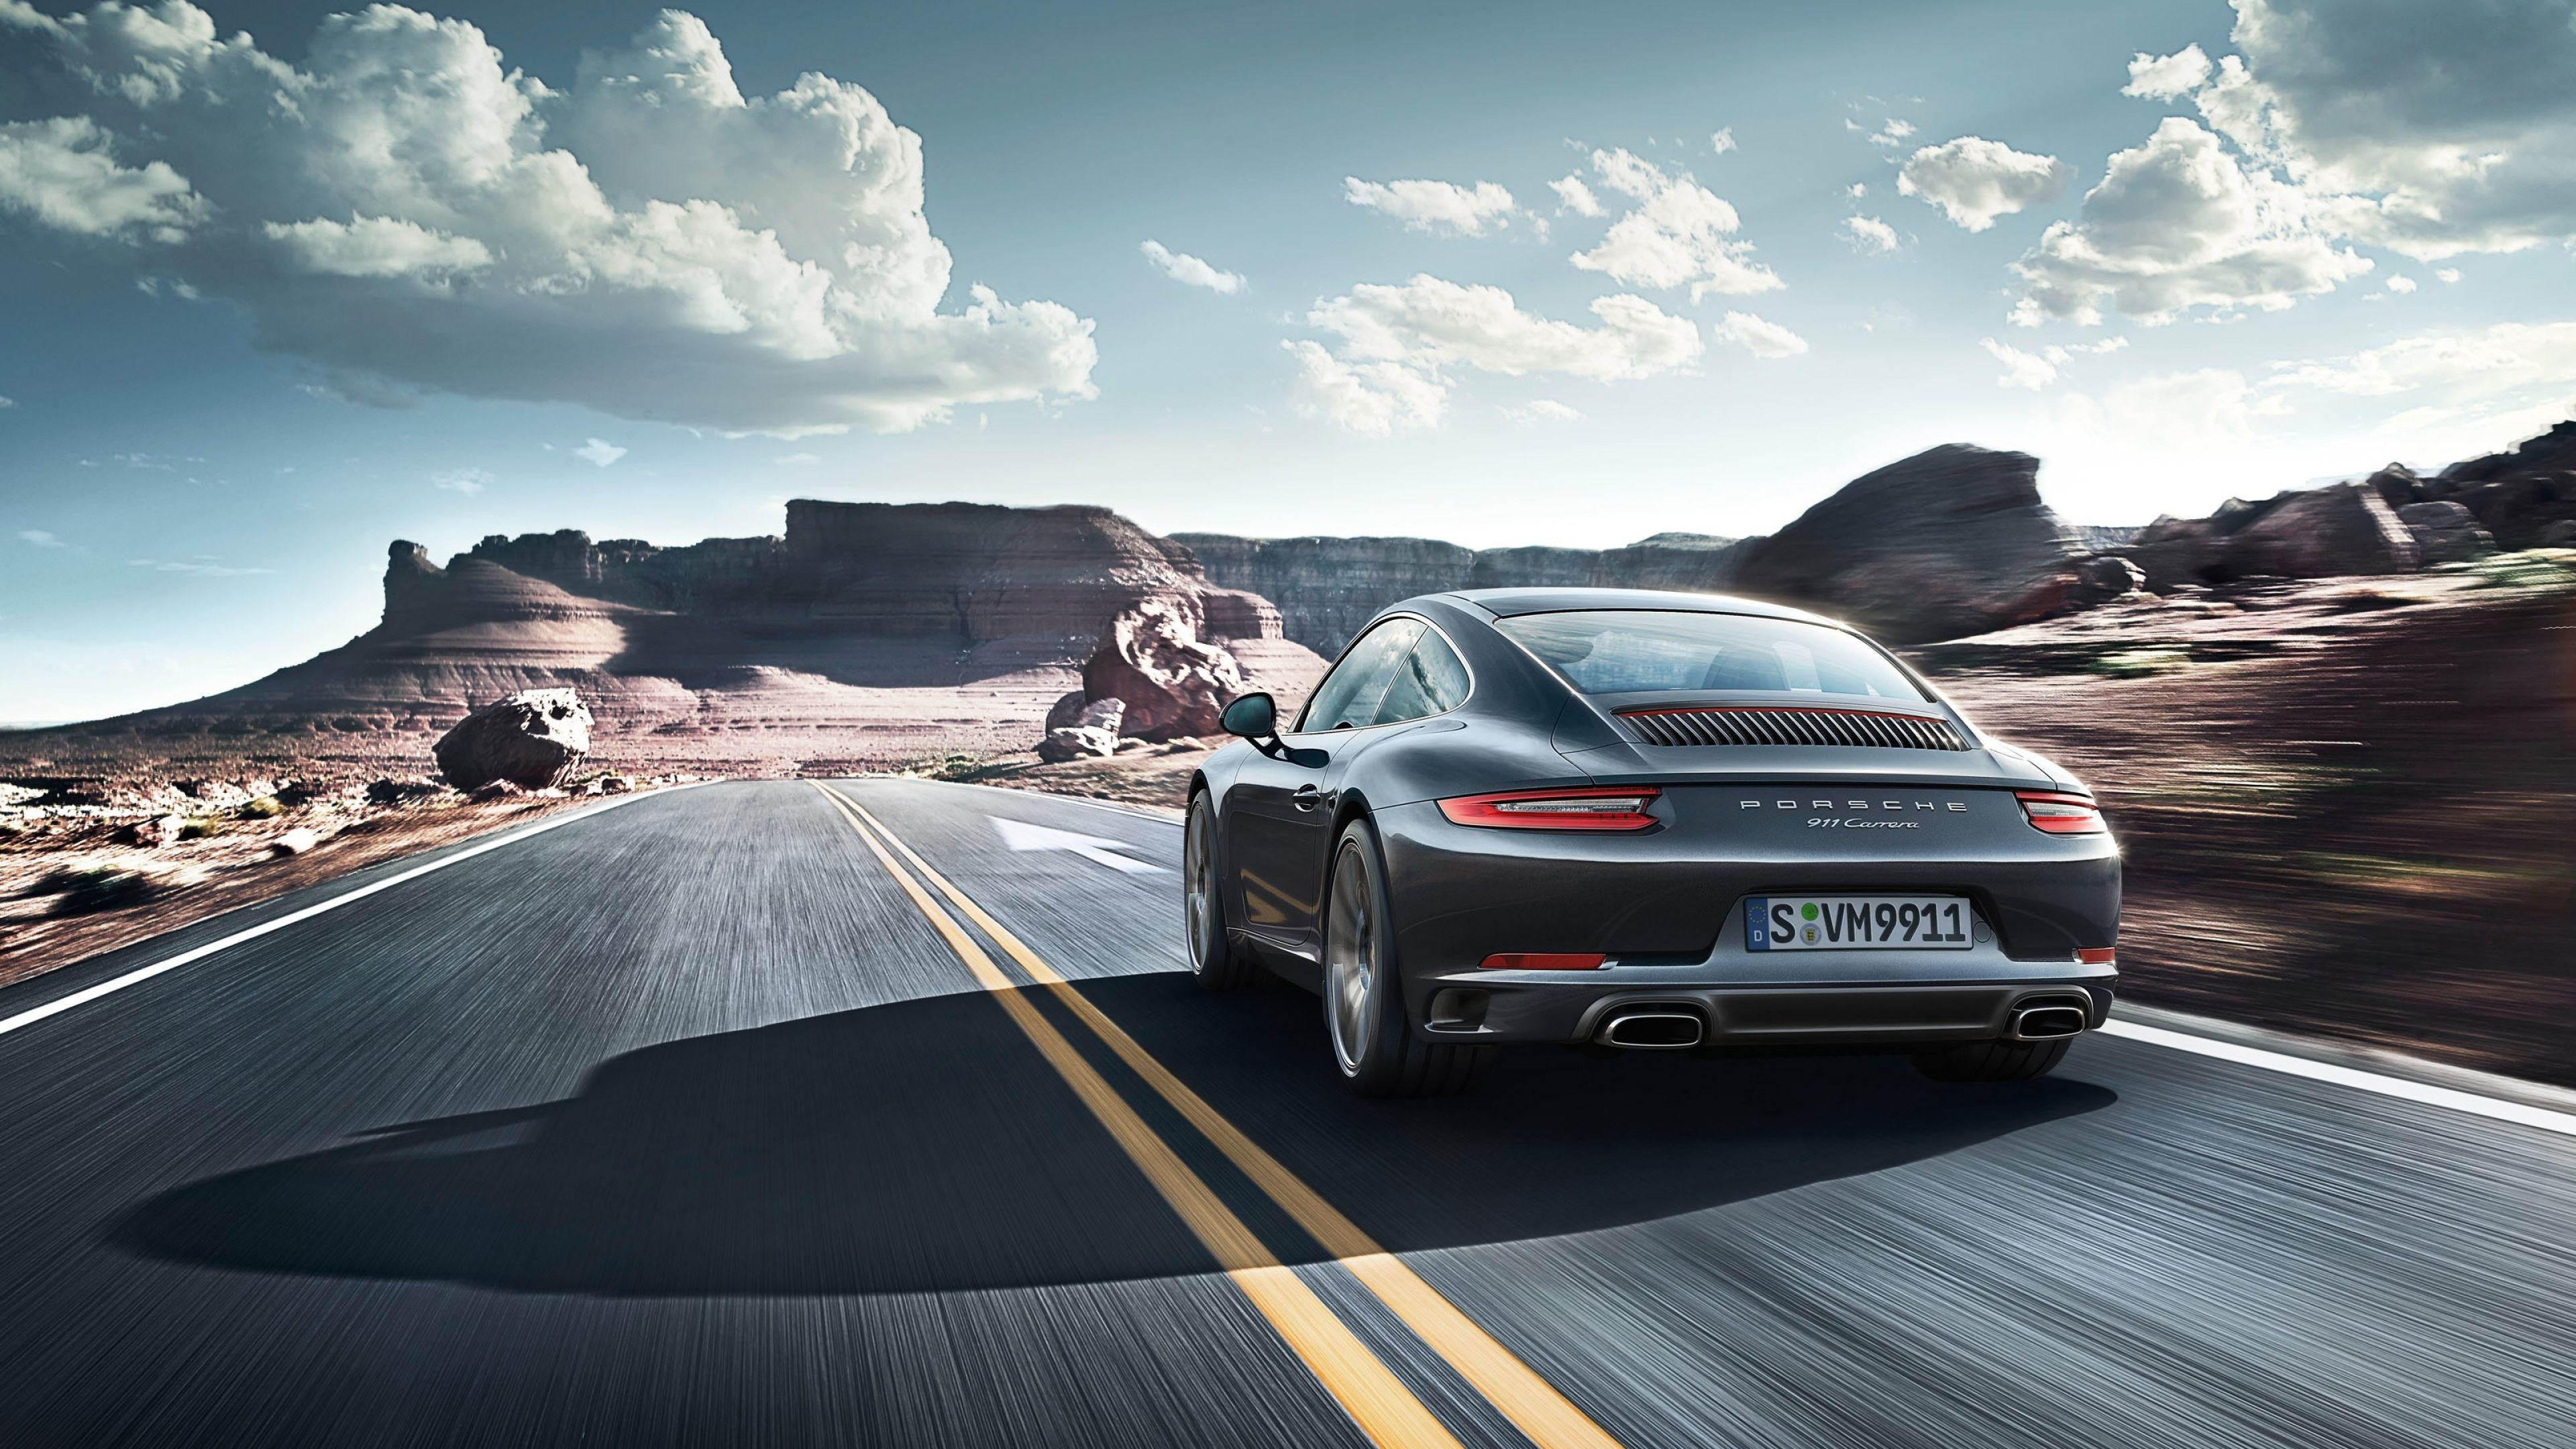 4K Ultra HD Porsche Wallpapers , Top Free 4K Ultra HD